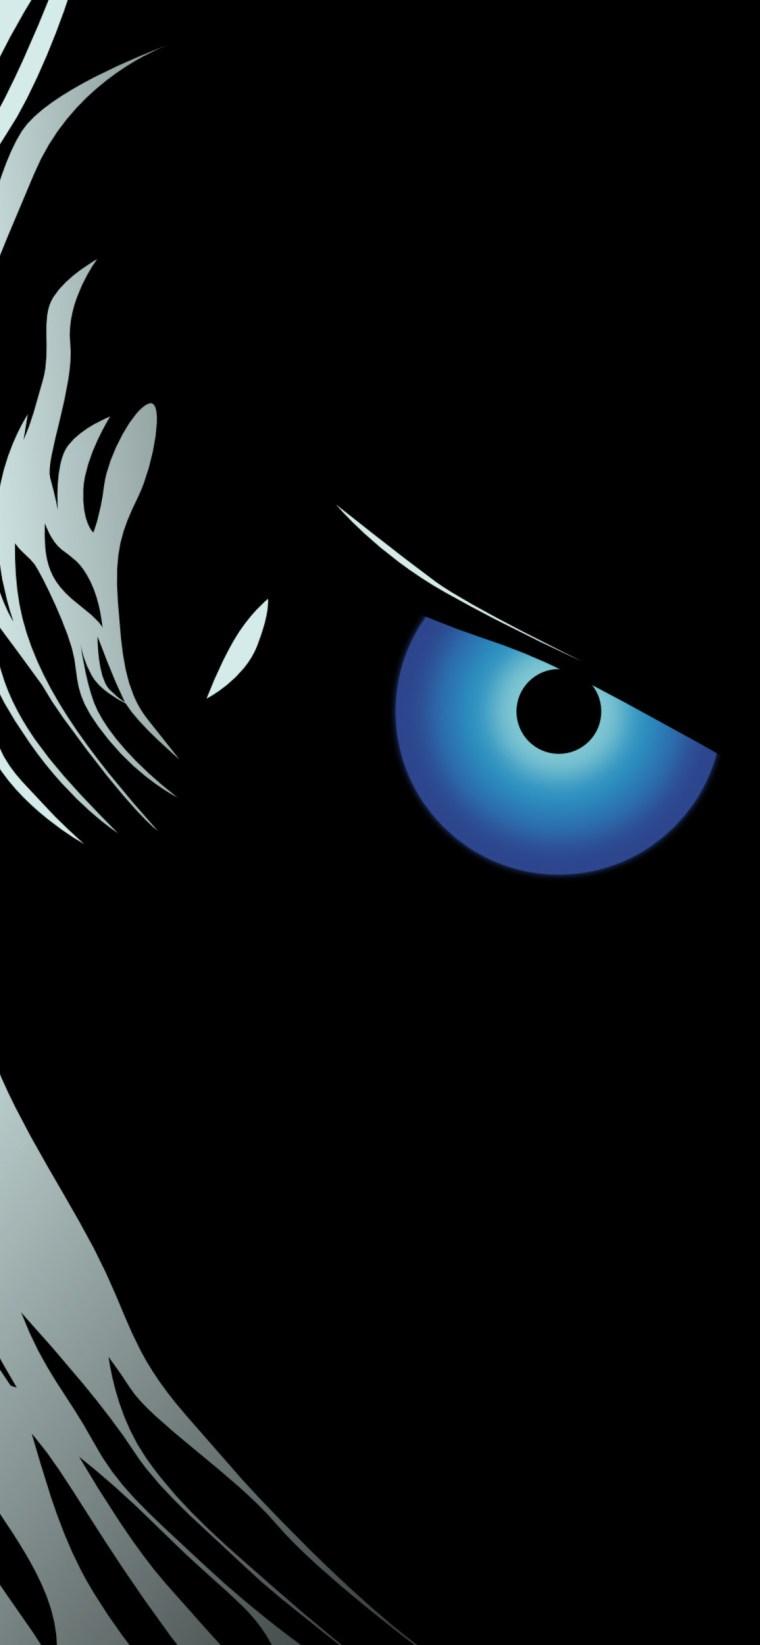 nightking-illustration iPhone game of thrones wallpaper